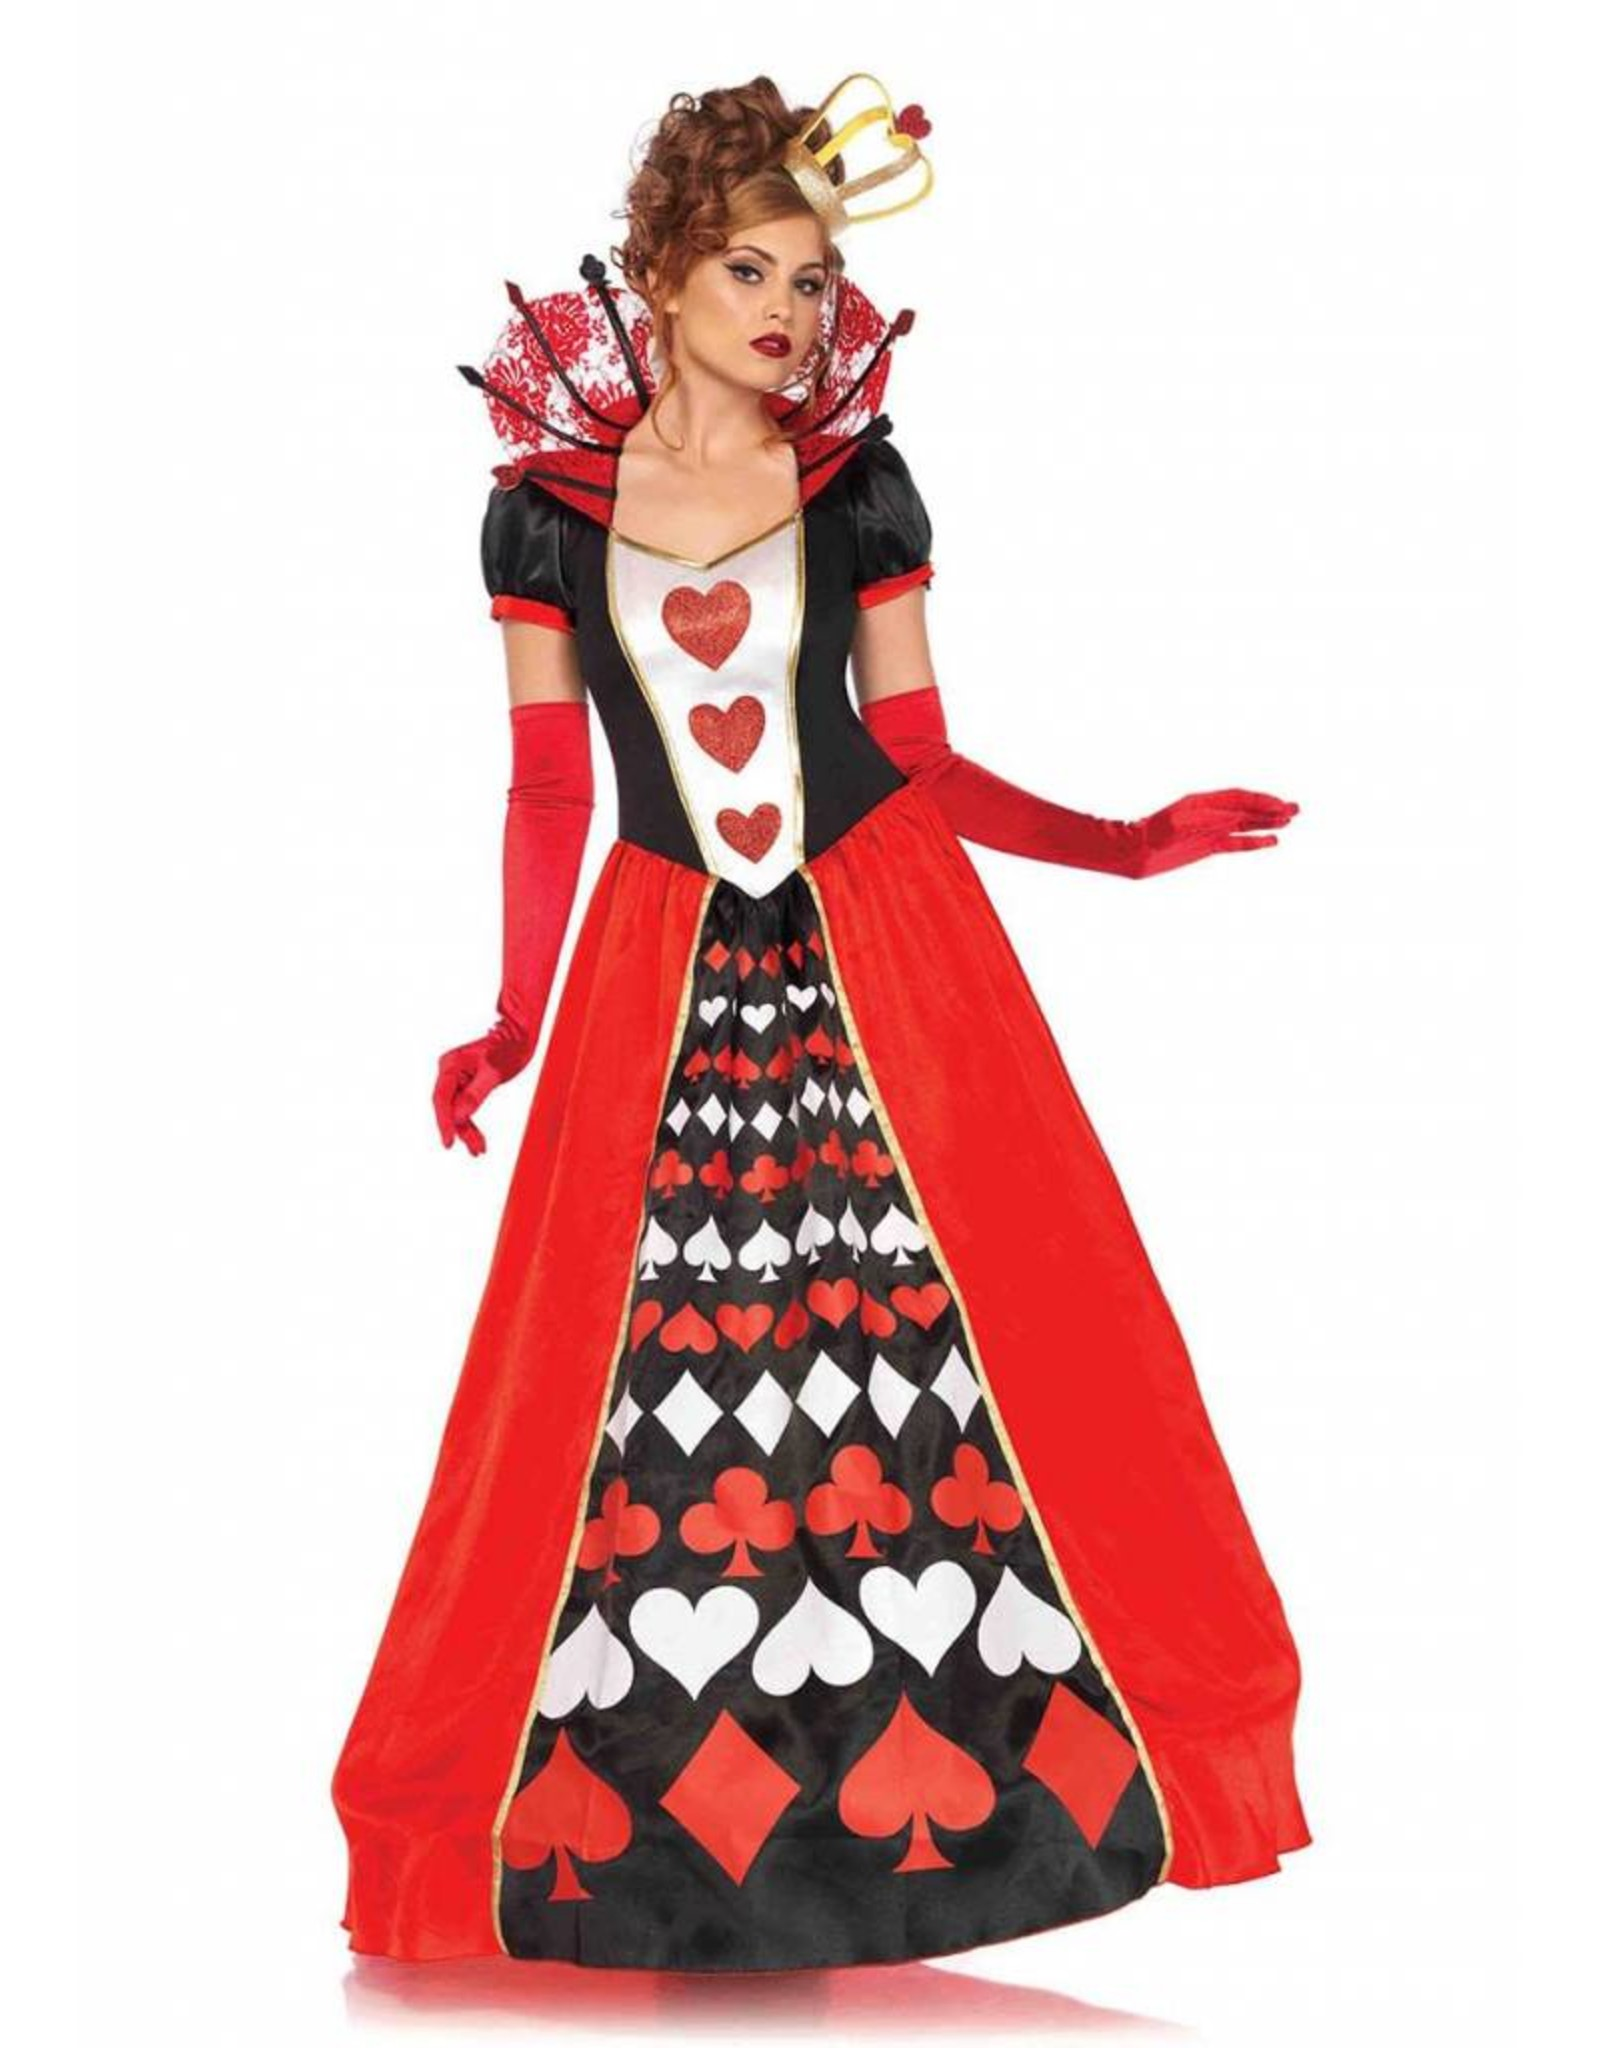 Leg Avenue Queen of Hearts DLX